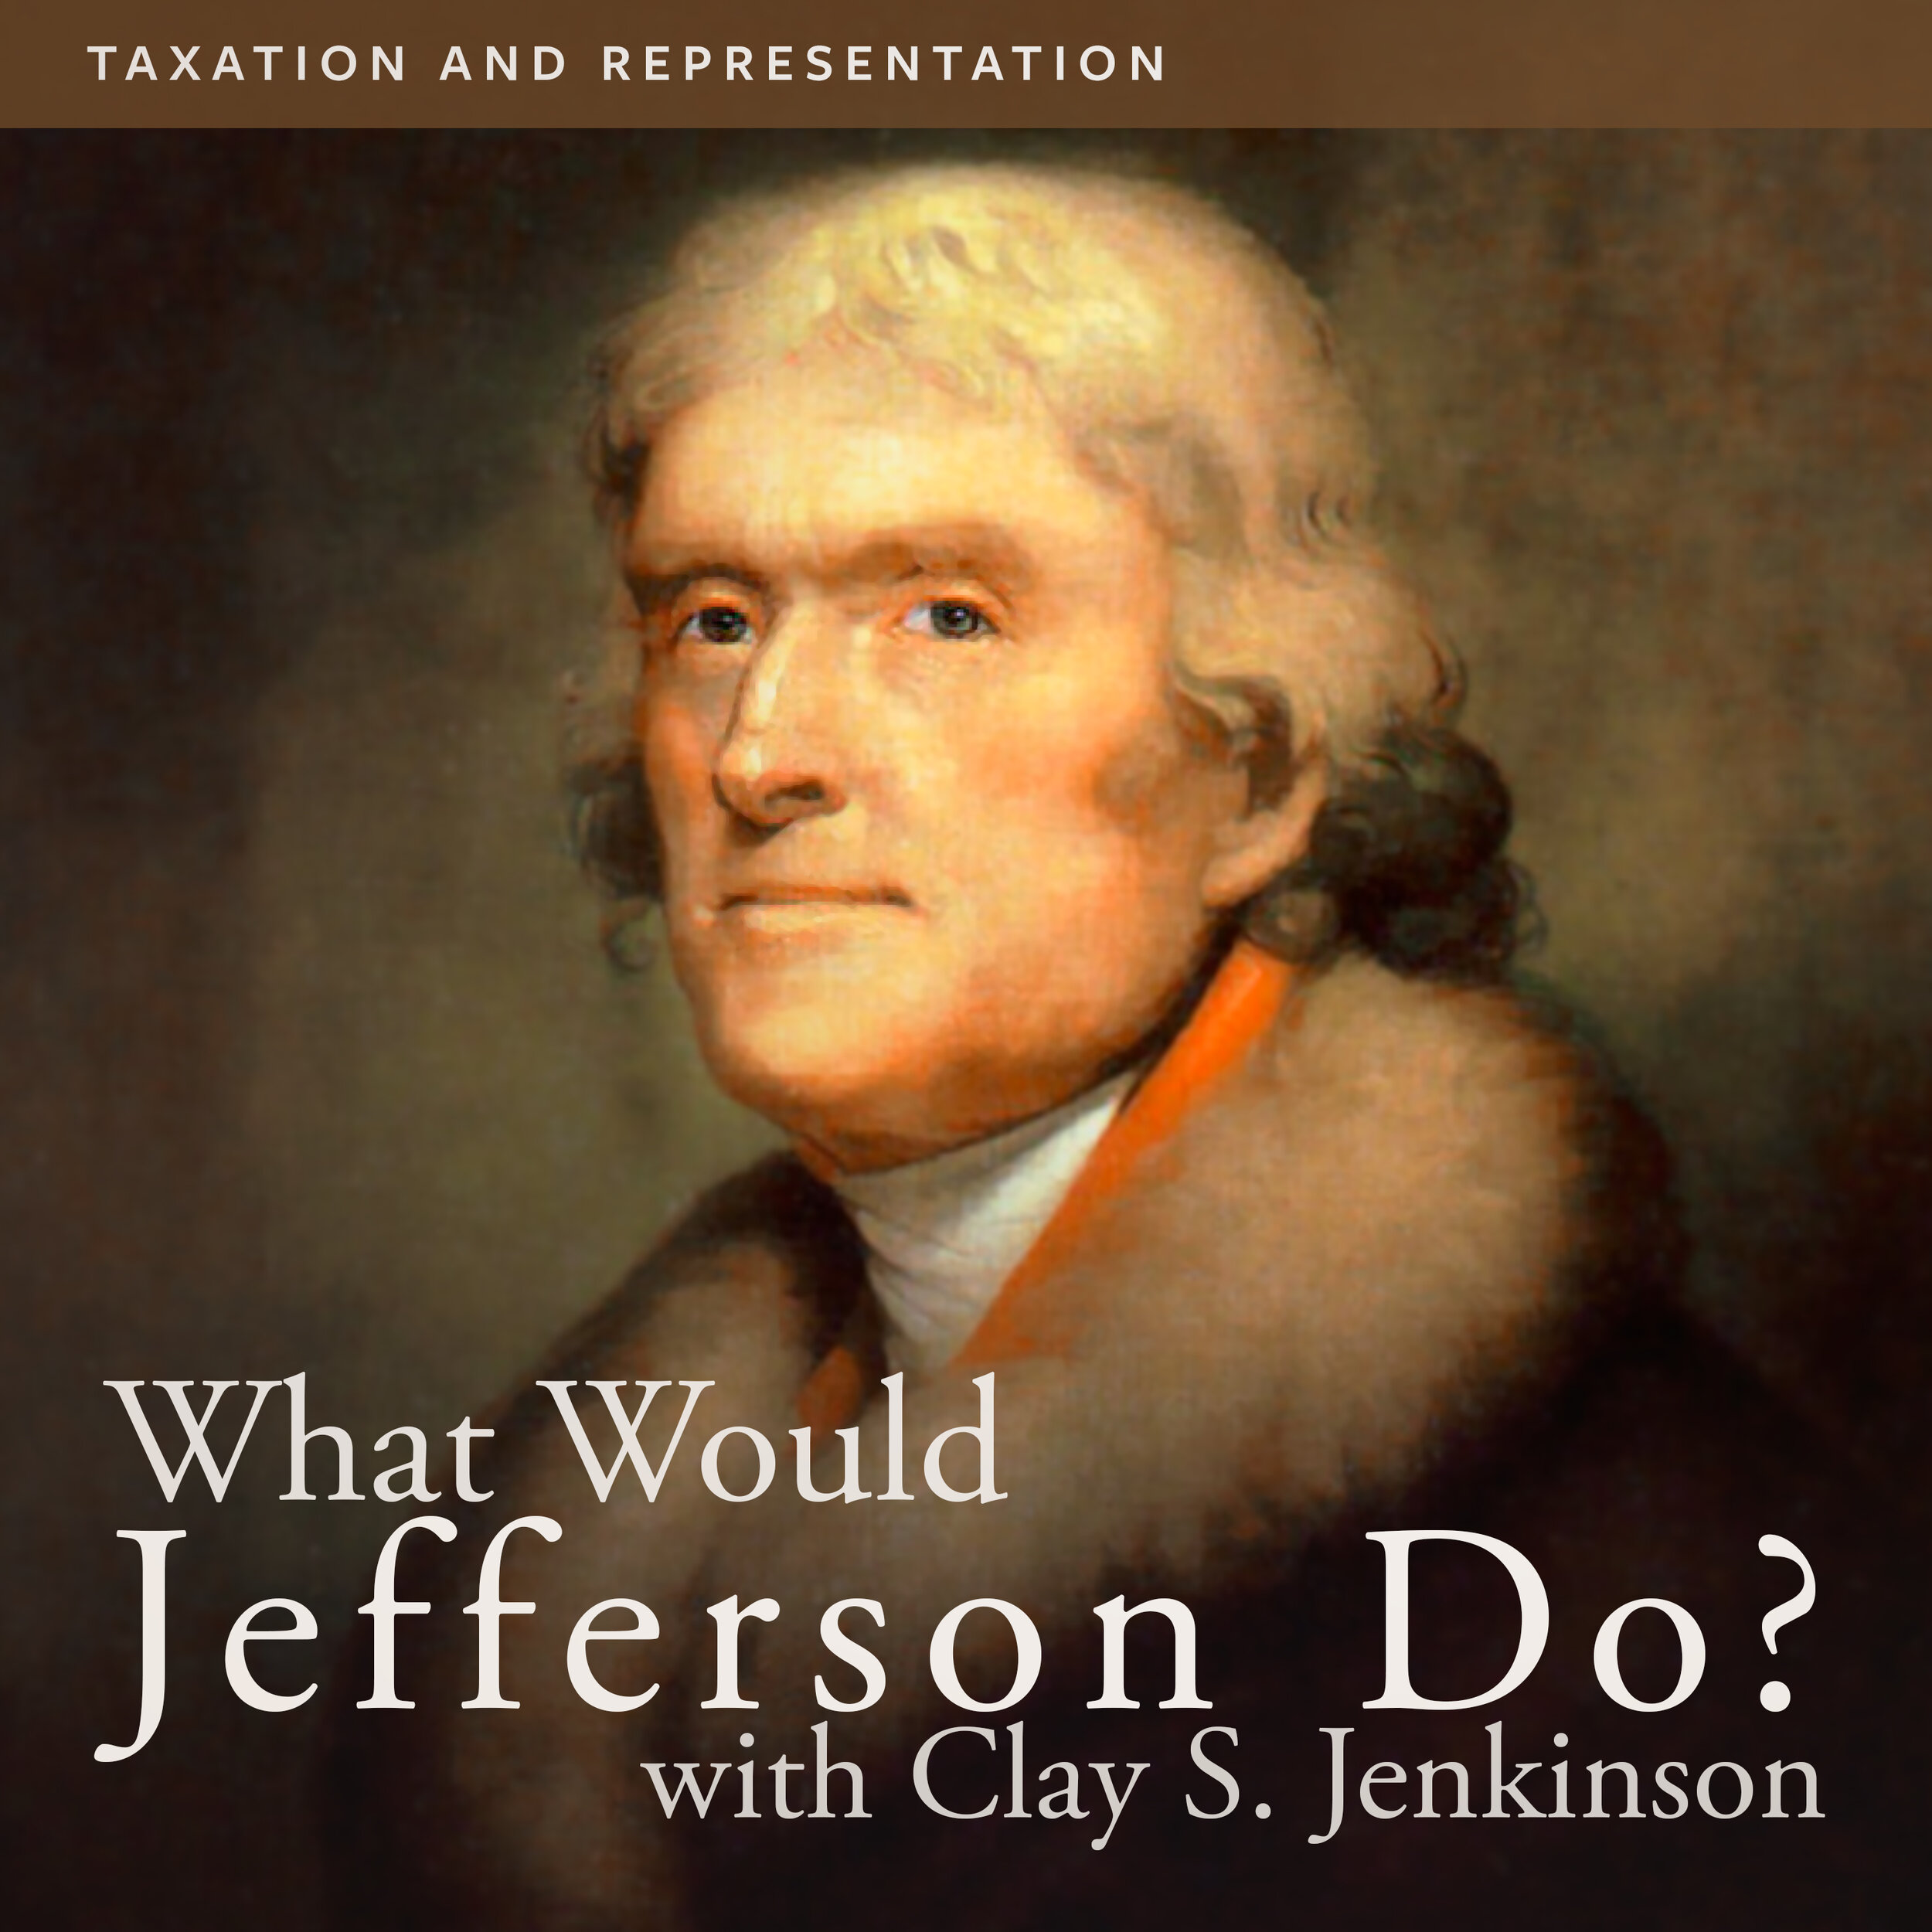 1356 WWTJD Taxation and Representation.jpg